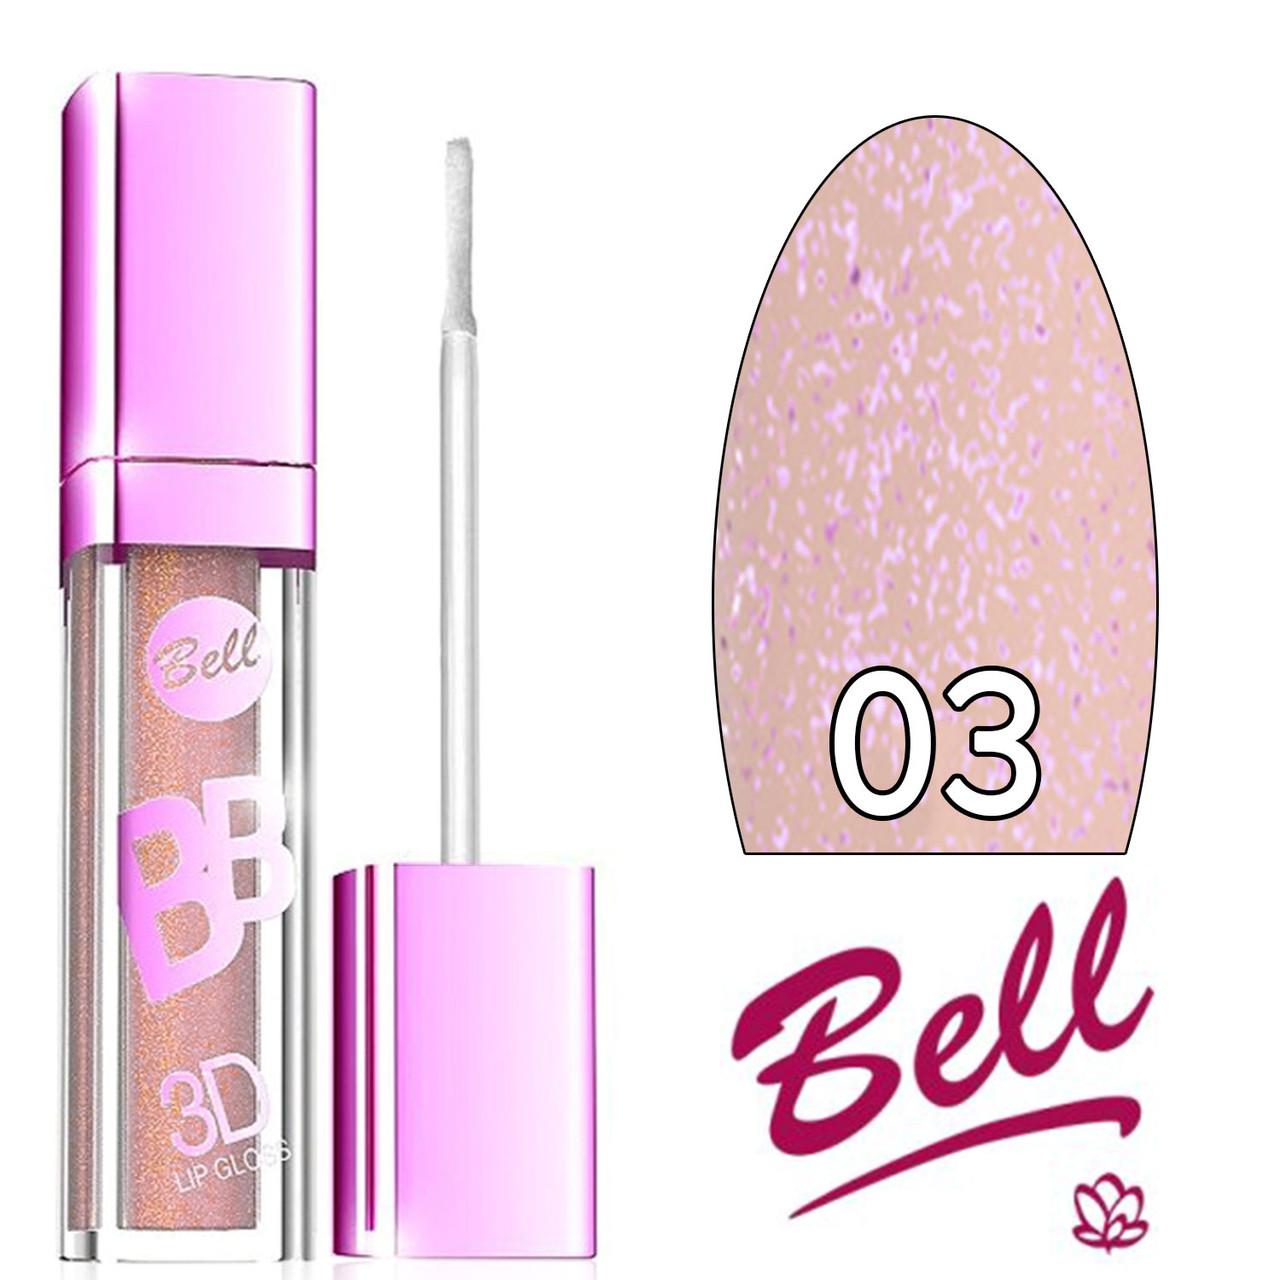 Bell - Блеск для губ BB 3D LipGloss Тон №03 pastel pink мерцающий